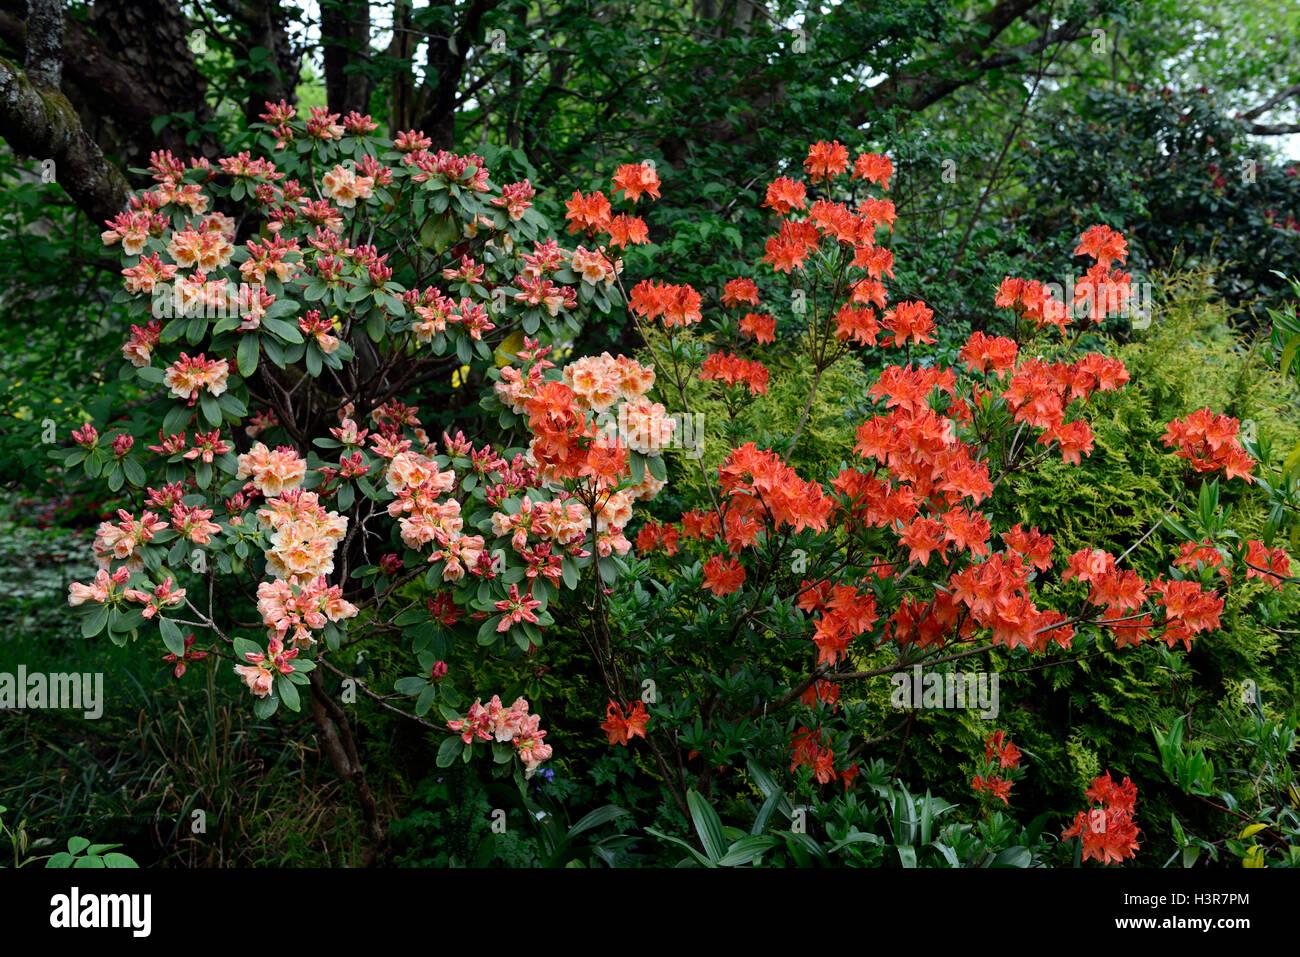 rhododendron orange flowers flowering shrub Altamont Gardens Carlow RM Floral - Stock Image